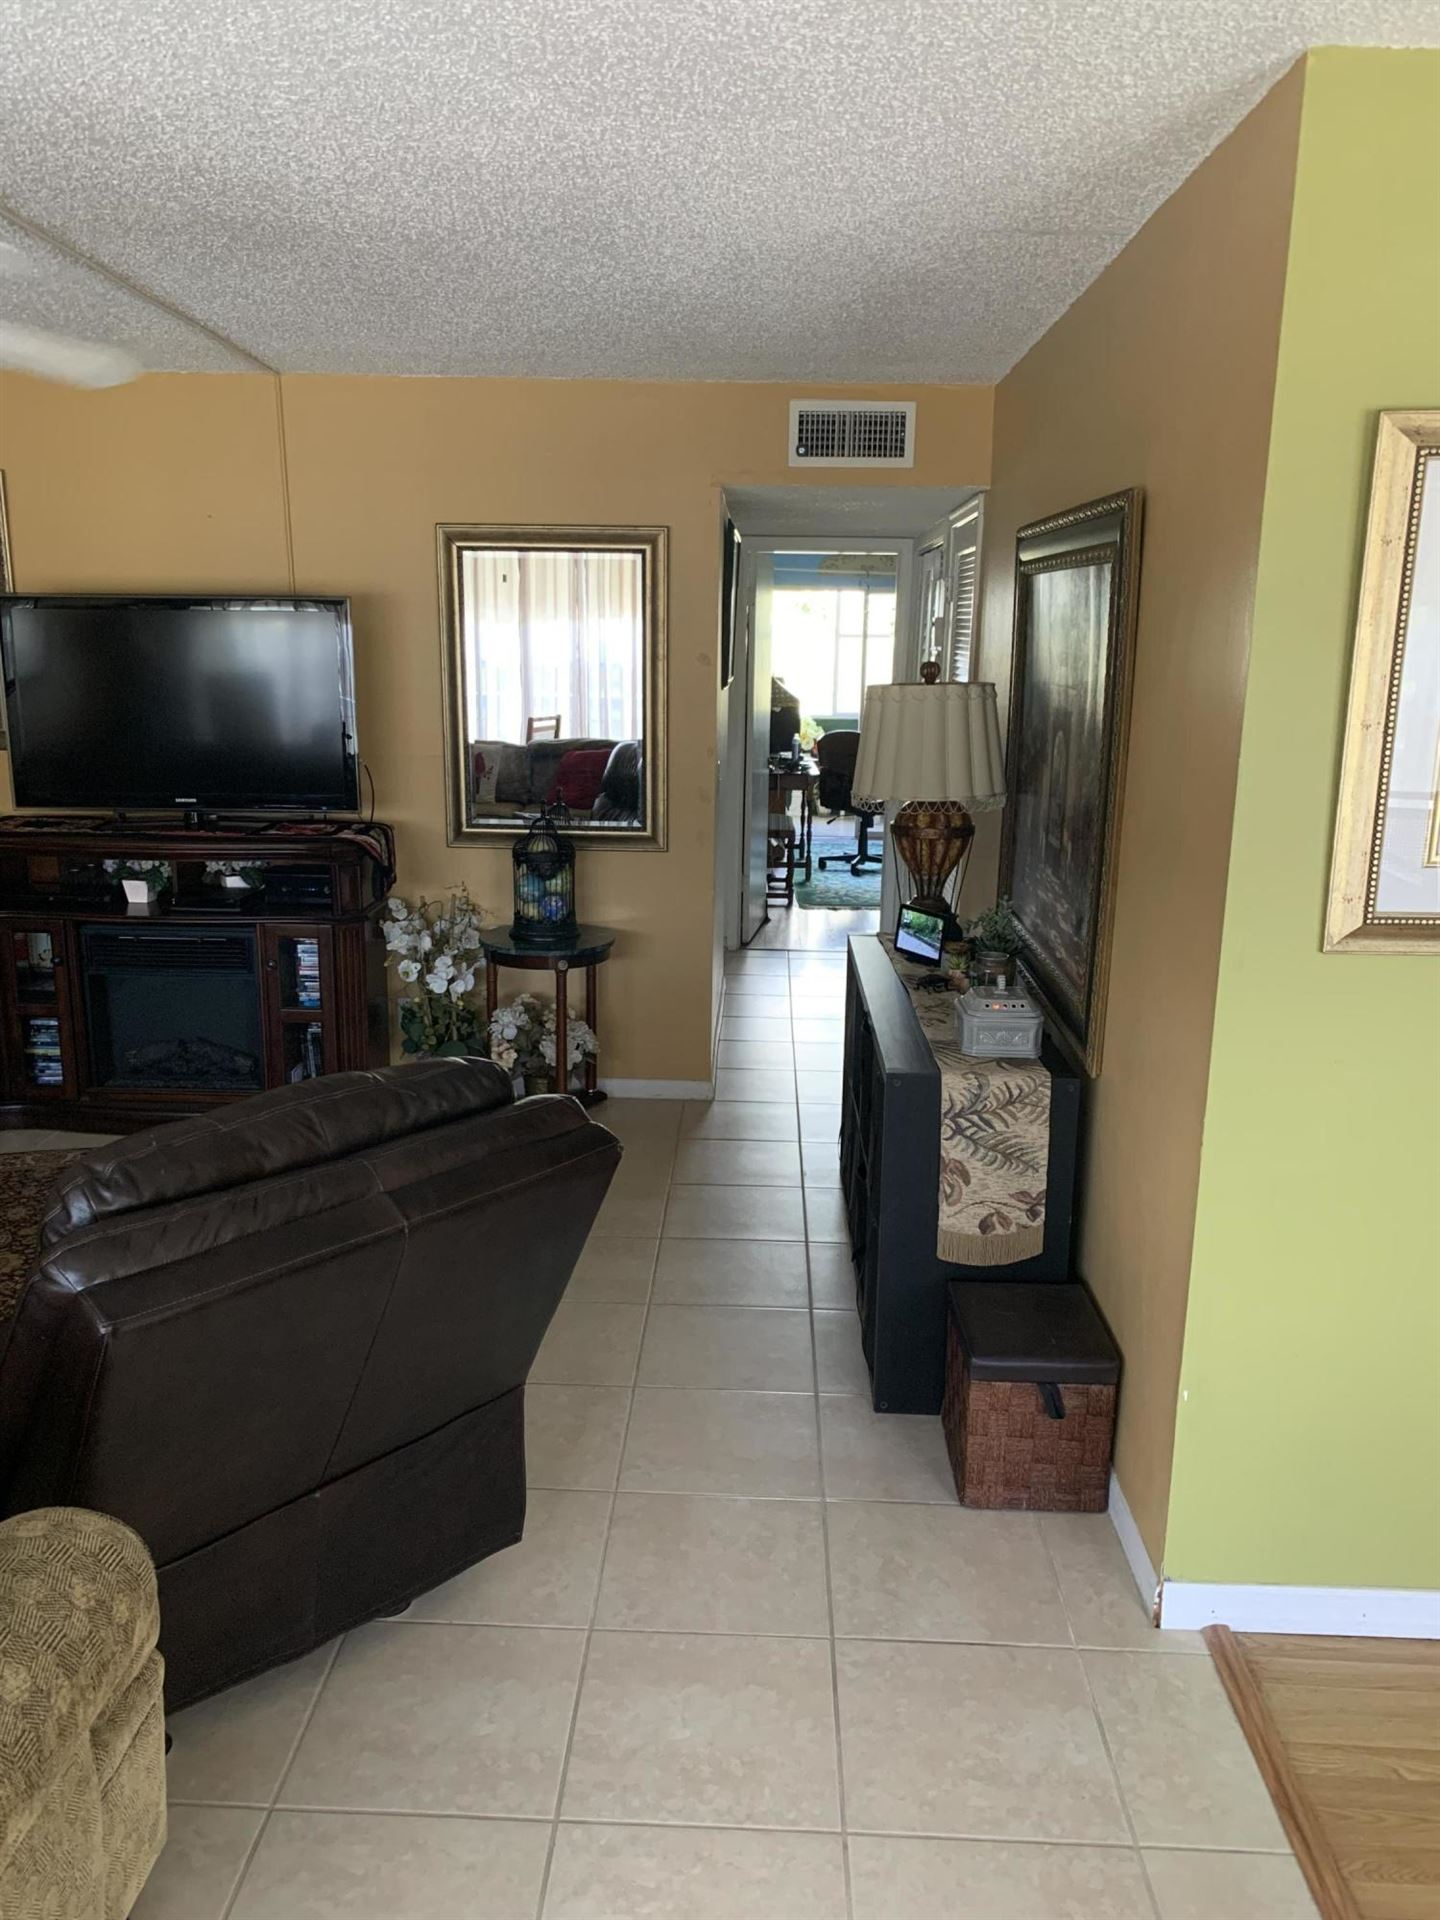 205 Greenbrier A #205, West Palm Beach, FL 33417 - MLS#: RX-10704070